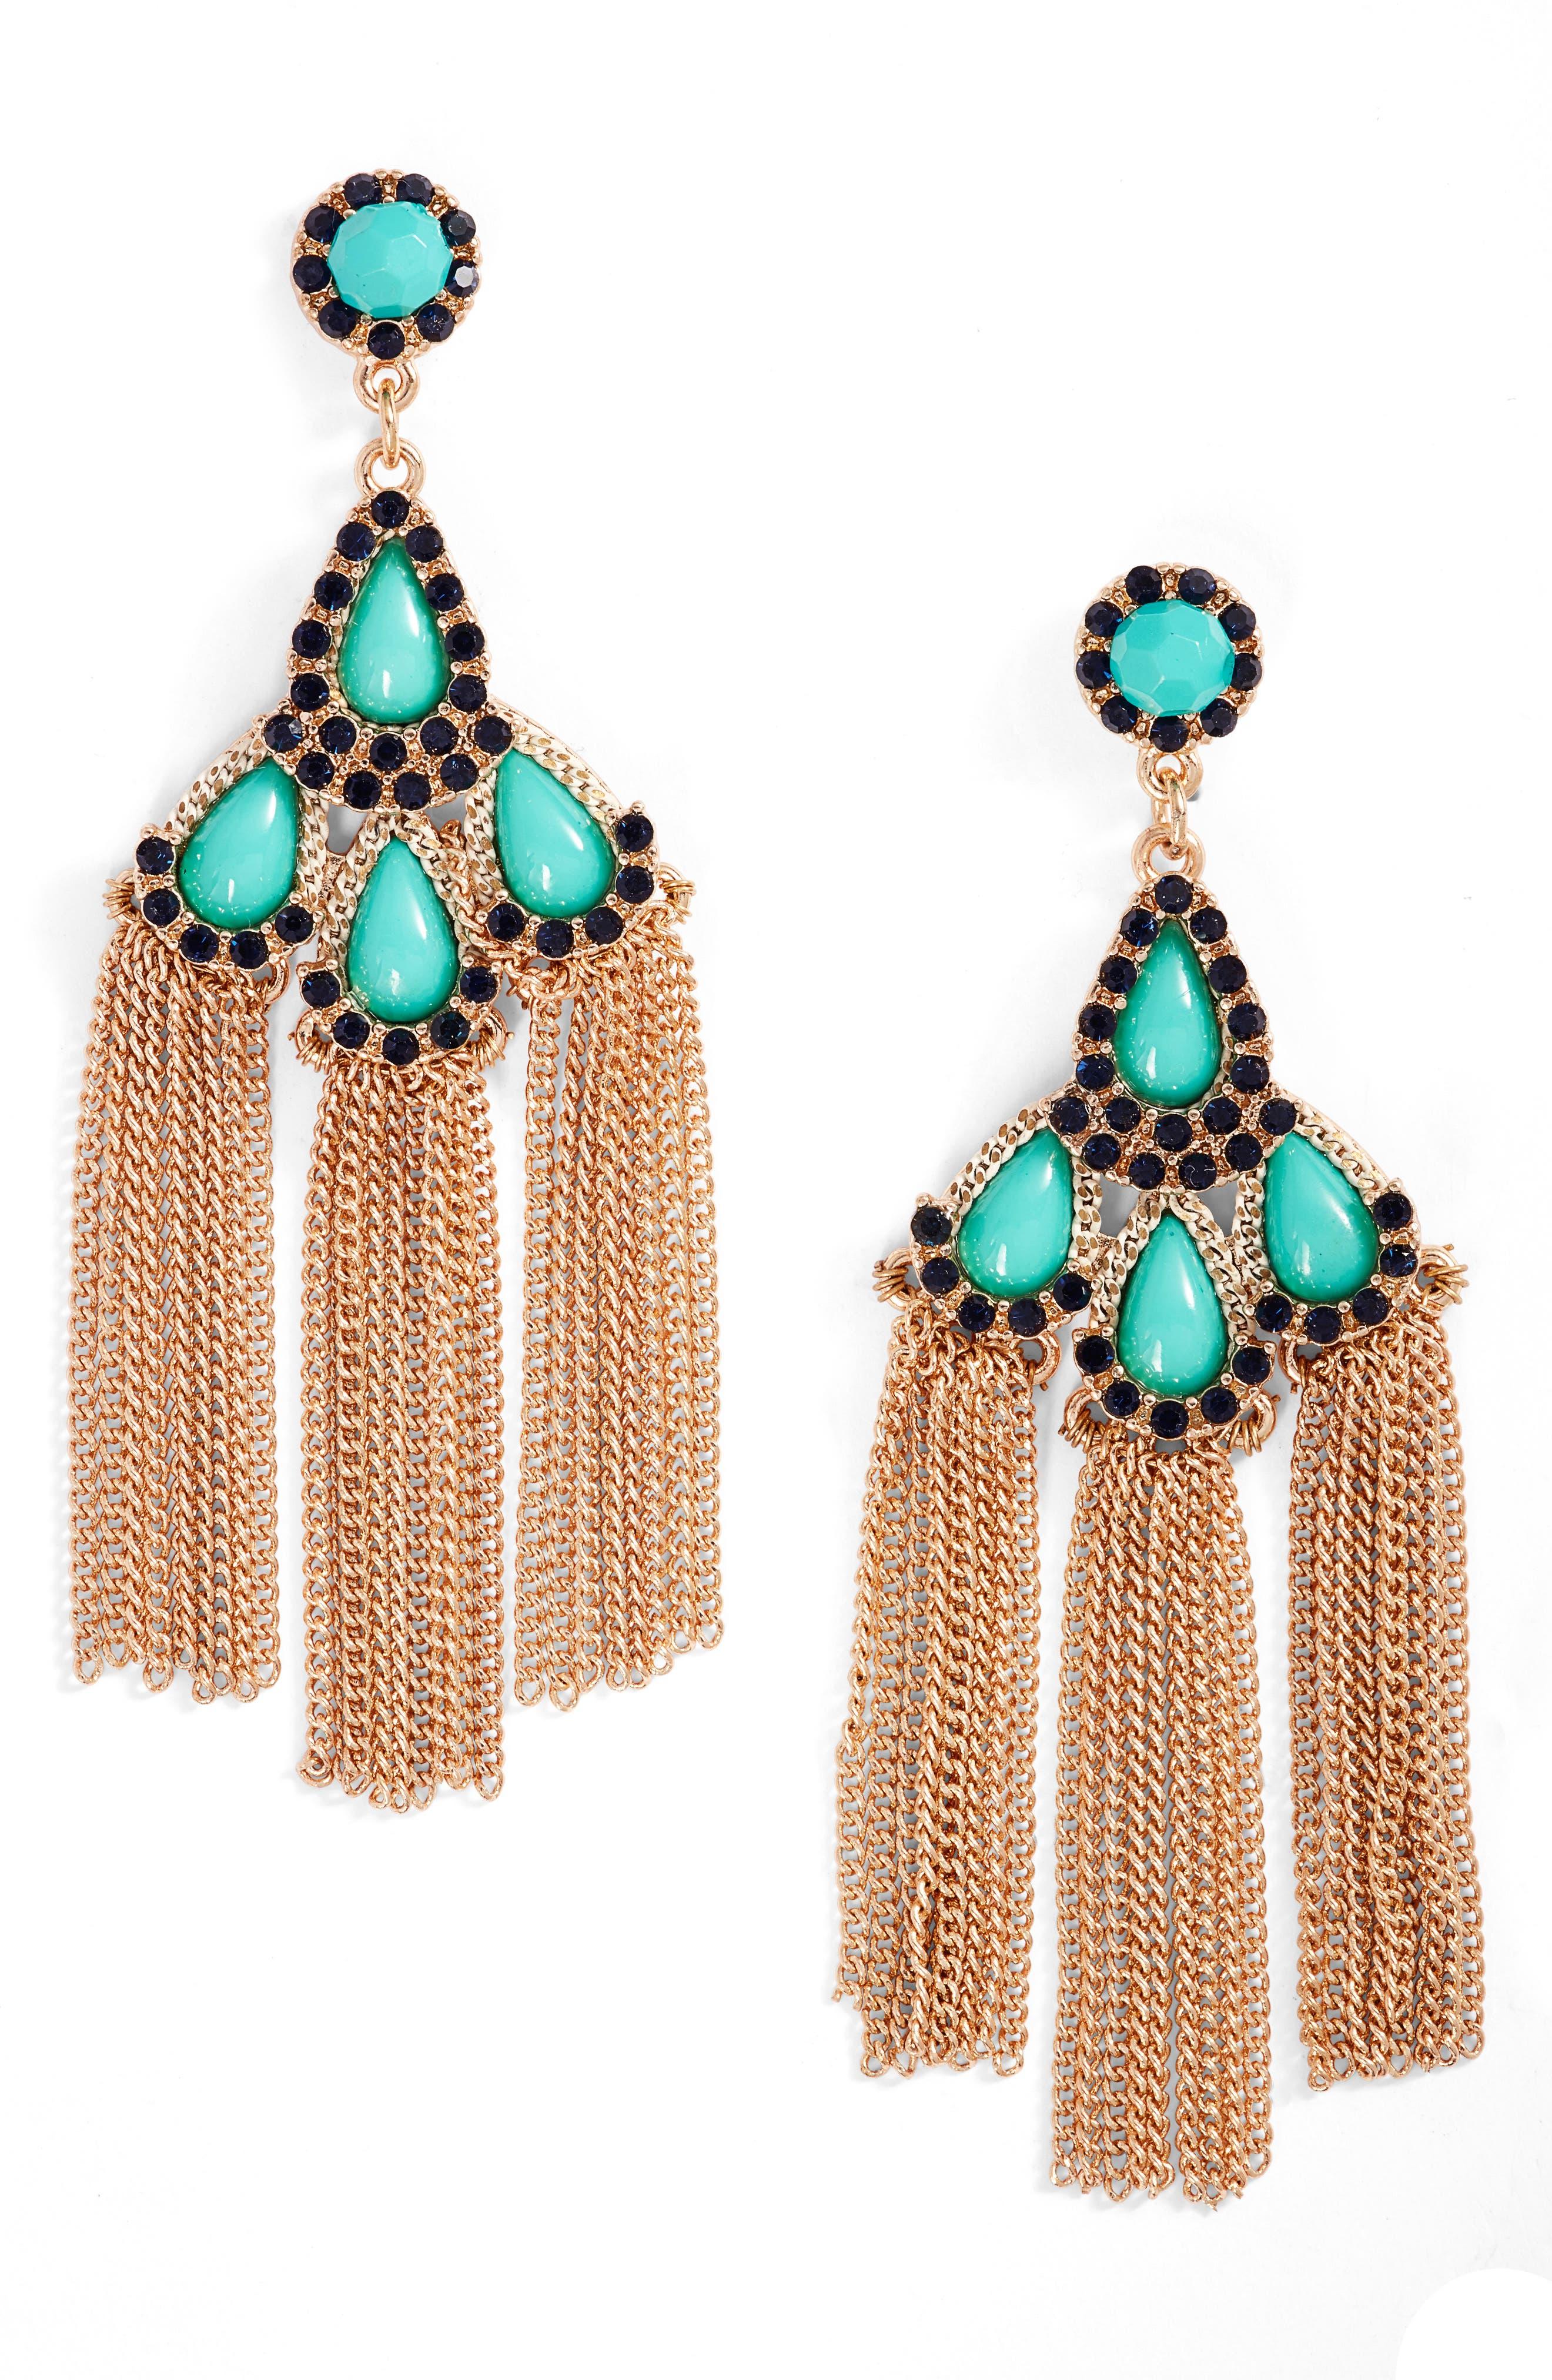 Chain Fringe Drop Earrings,                             Main thumbnail 1, color,                             400